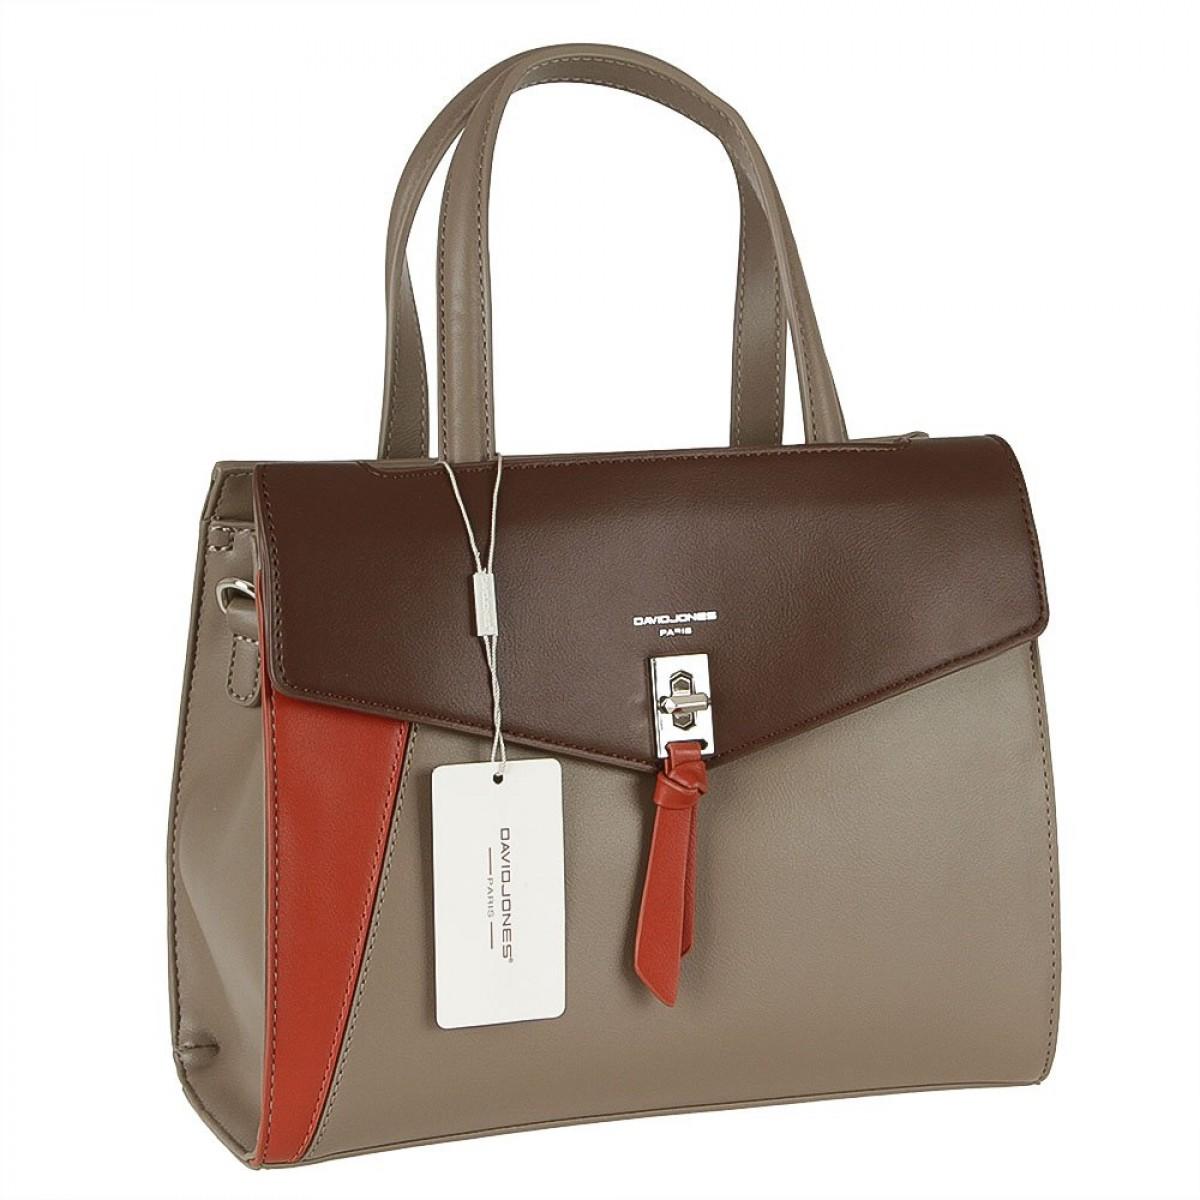 Жіноча сумка David Jones 6410-2 TAUPE